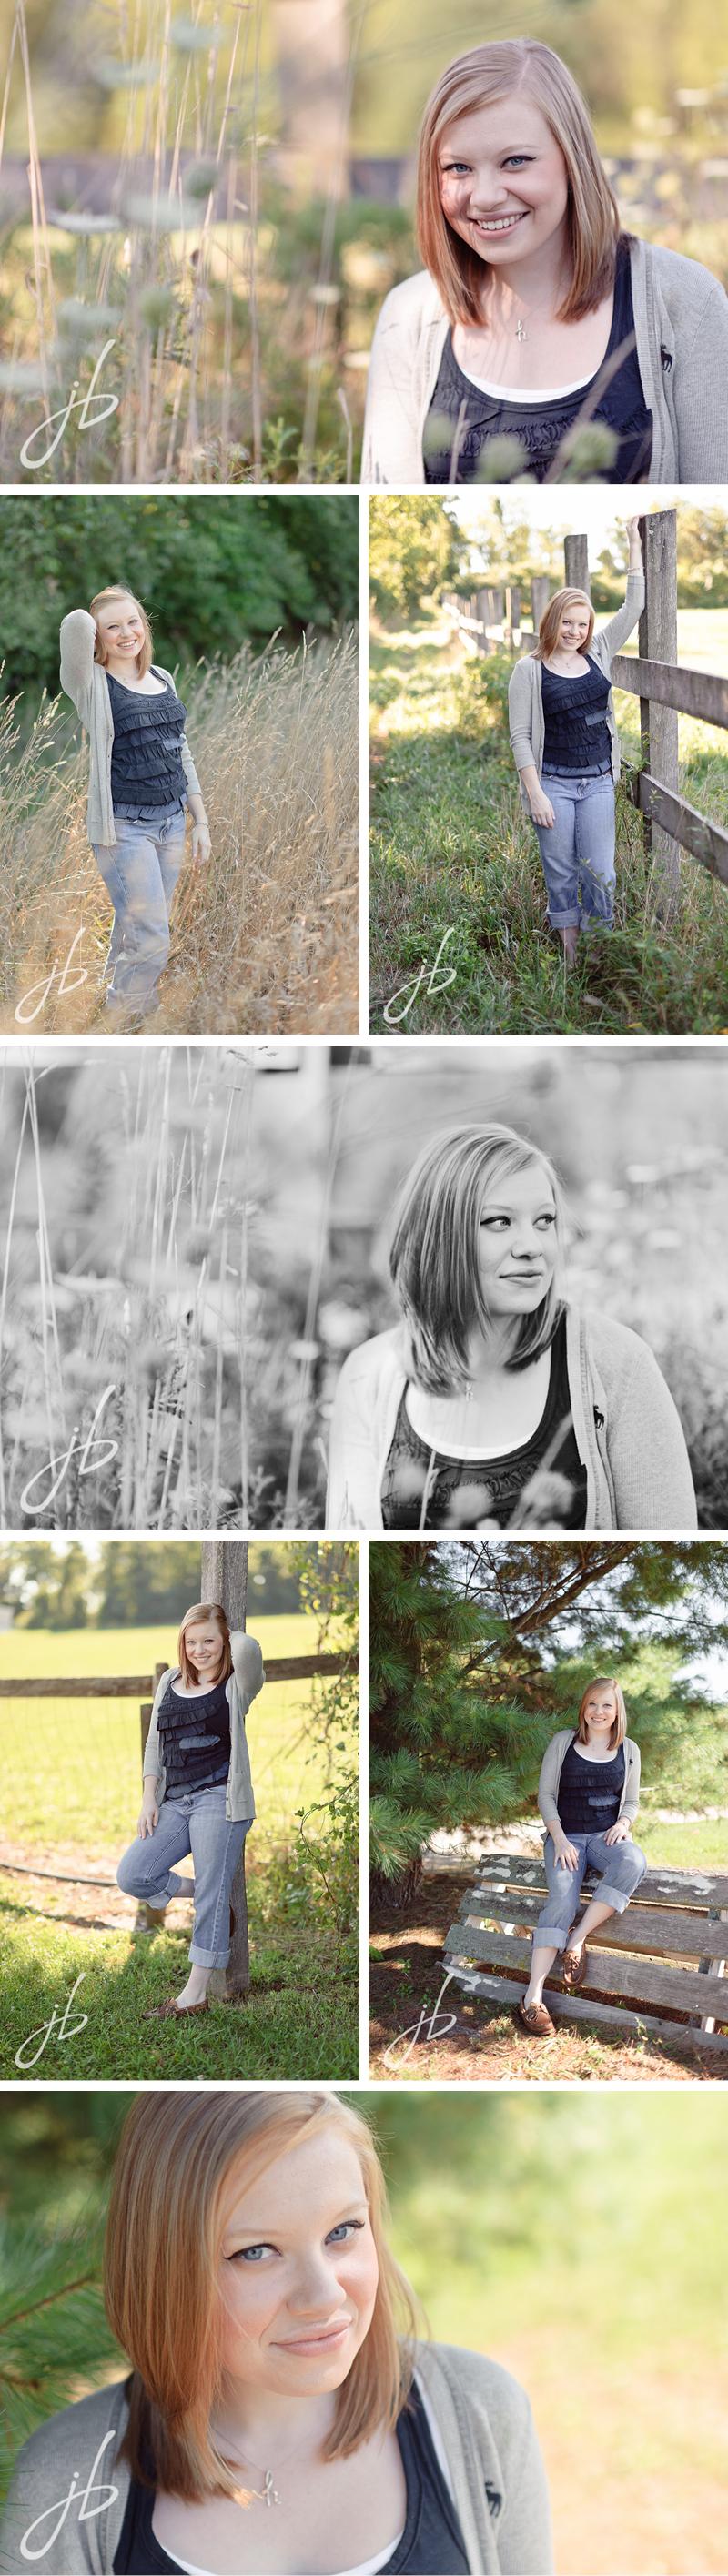 Lancaster Senior Portrait Photography by Jeremy Bischoff Photography 002